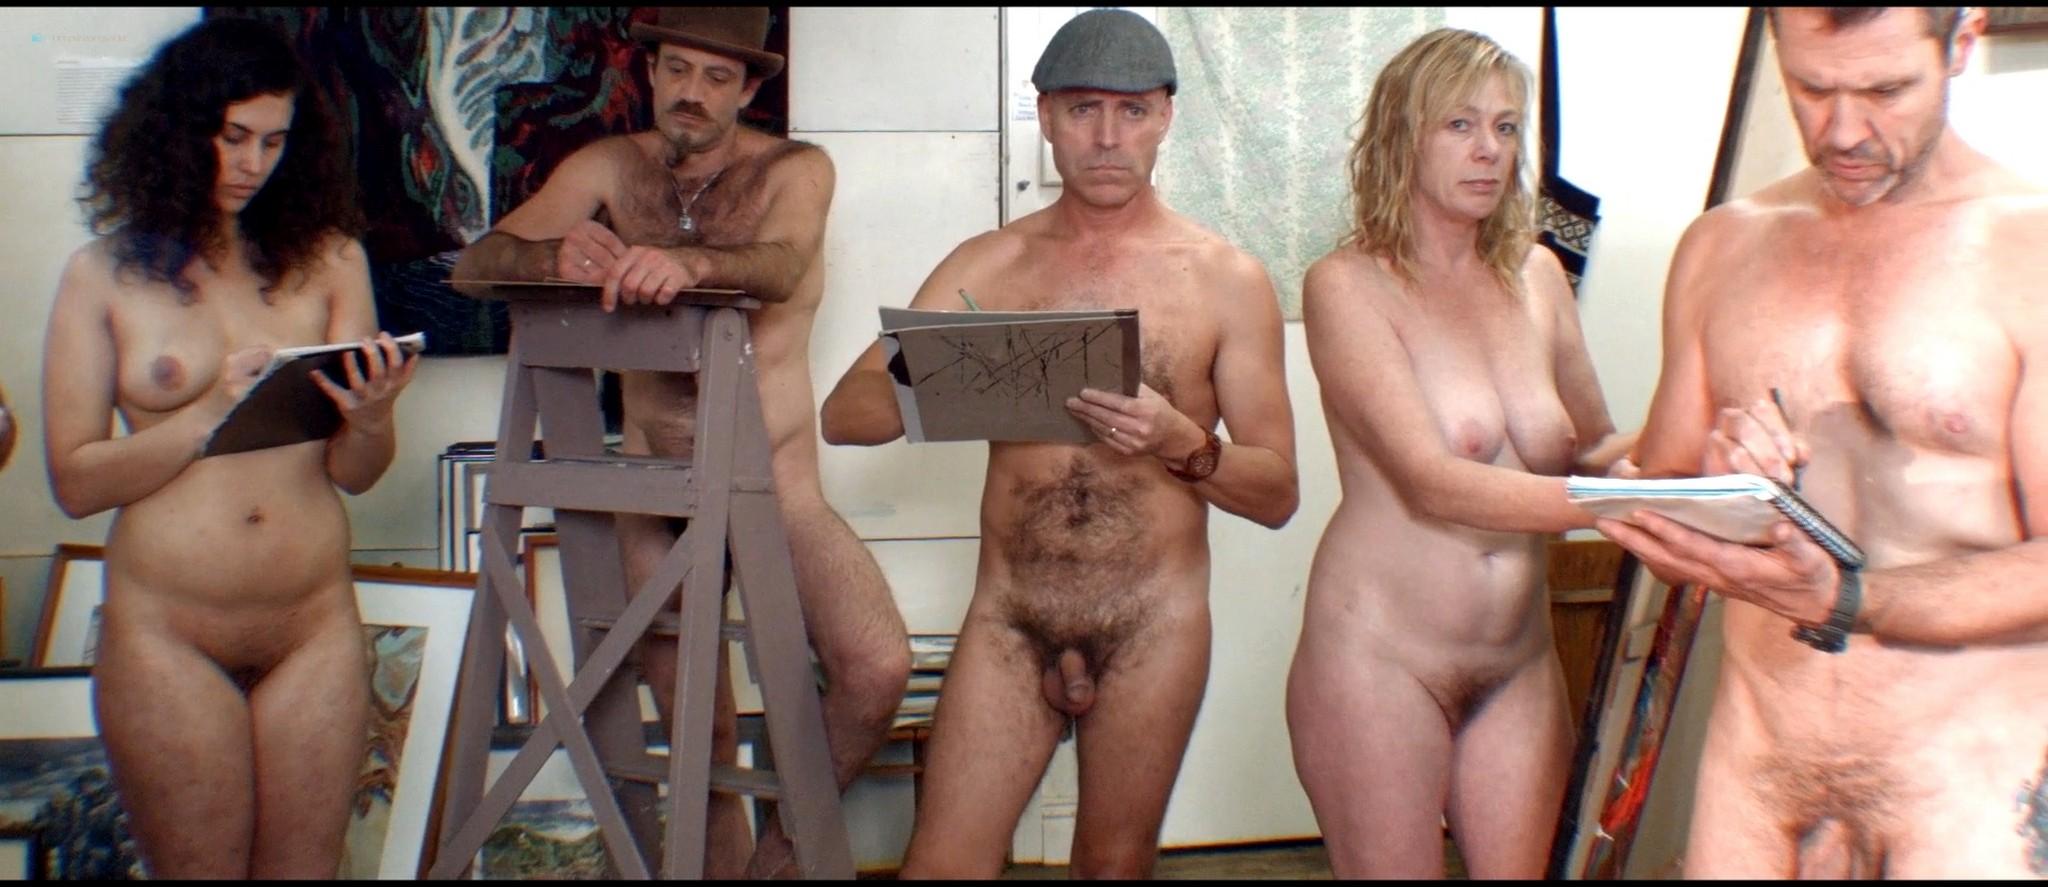 Saara Lamberg nude Jenni Mitchell, April Garreffa nude too - Innuendo (2017) HD 1080p Web (8)